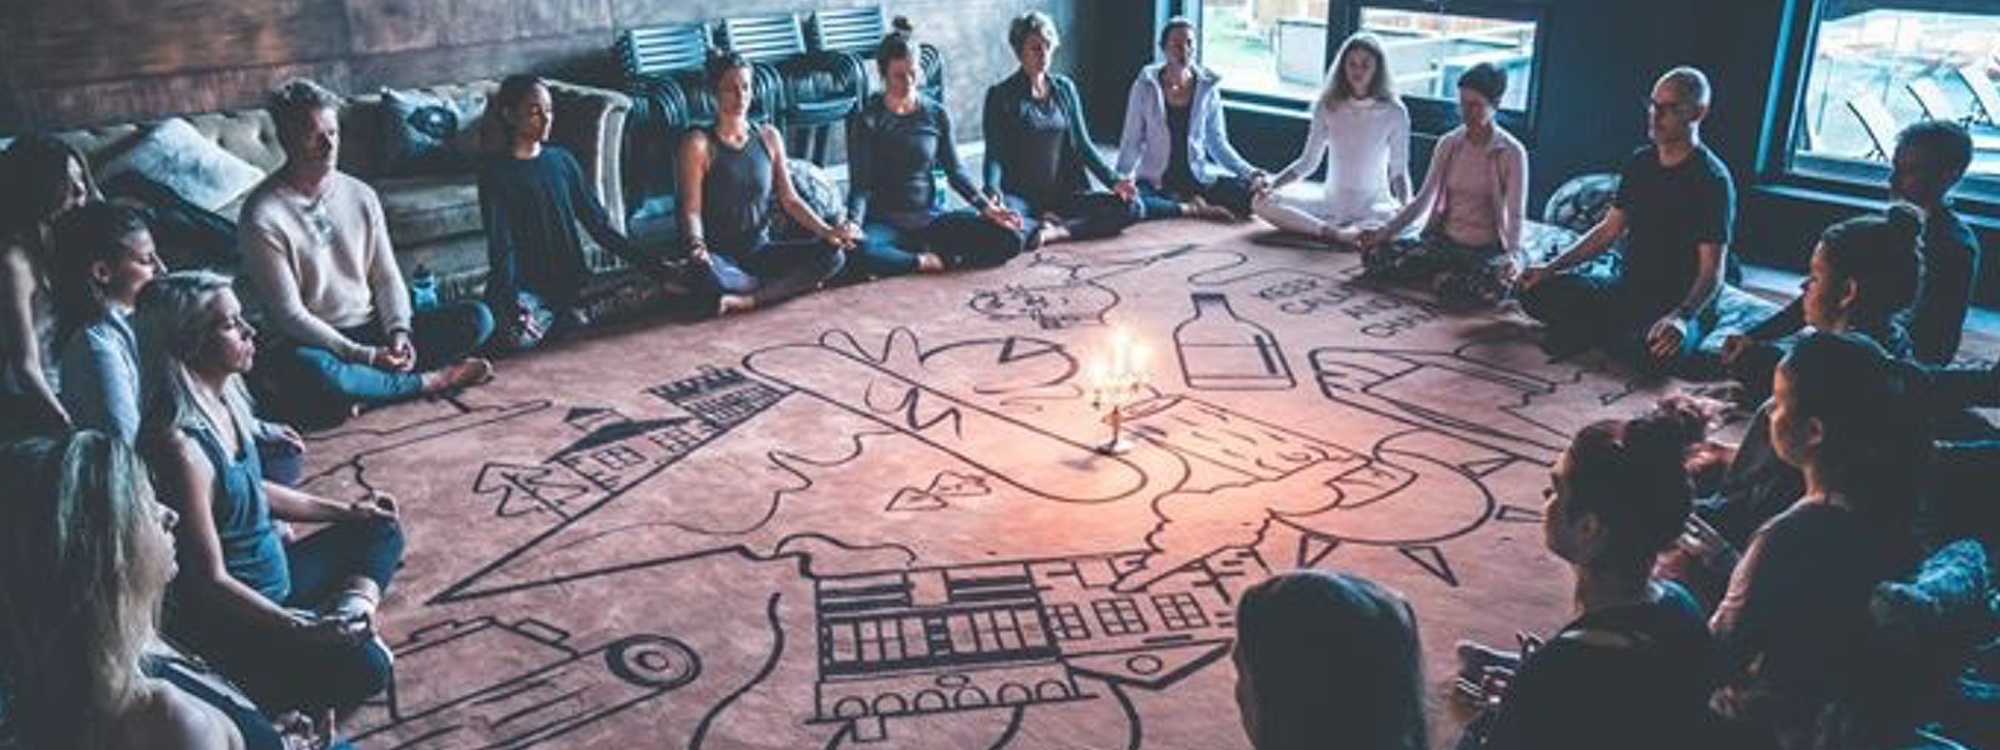 2018-06-07 - dobreathe - blog image meditation group.jpg